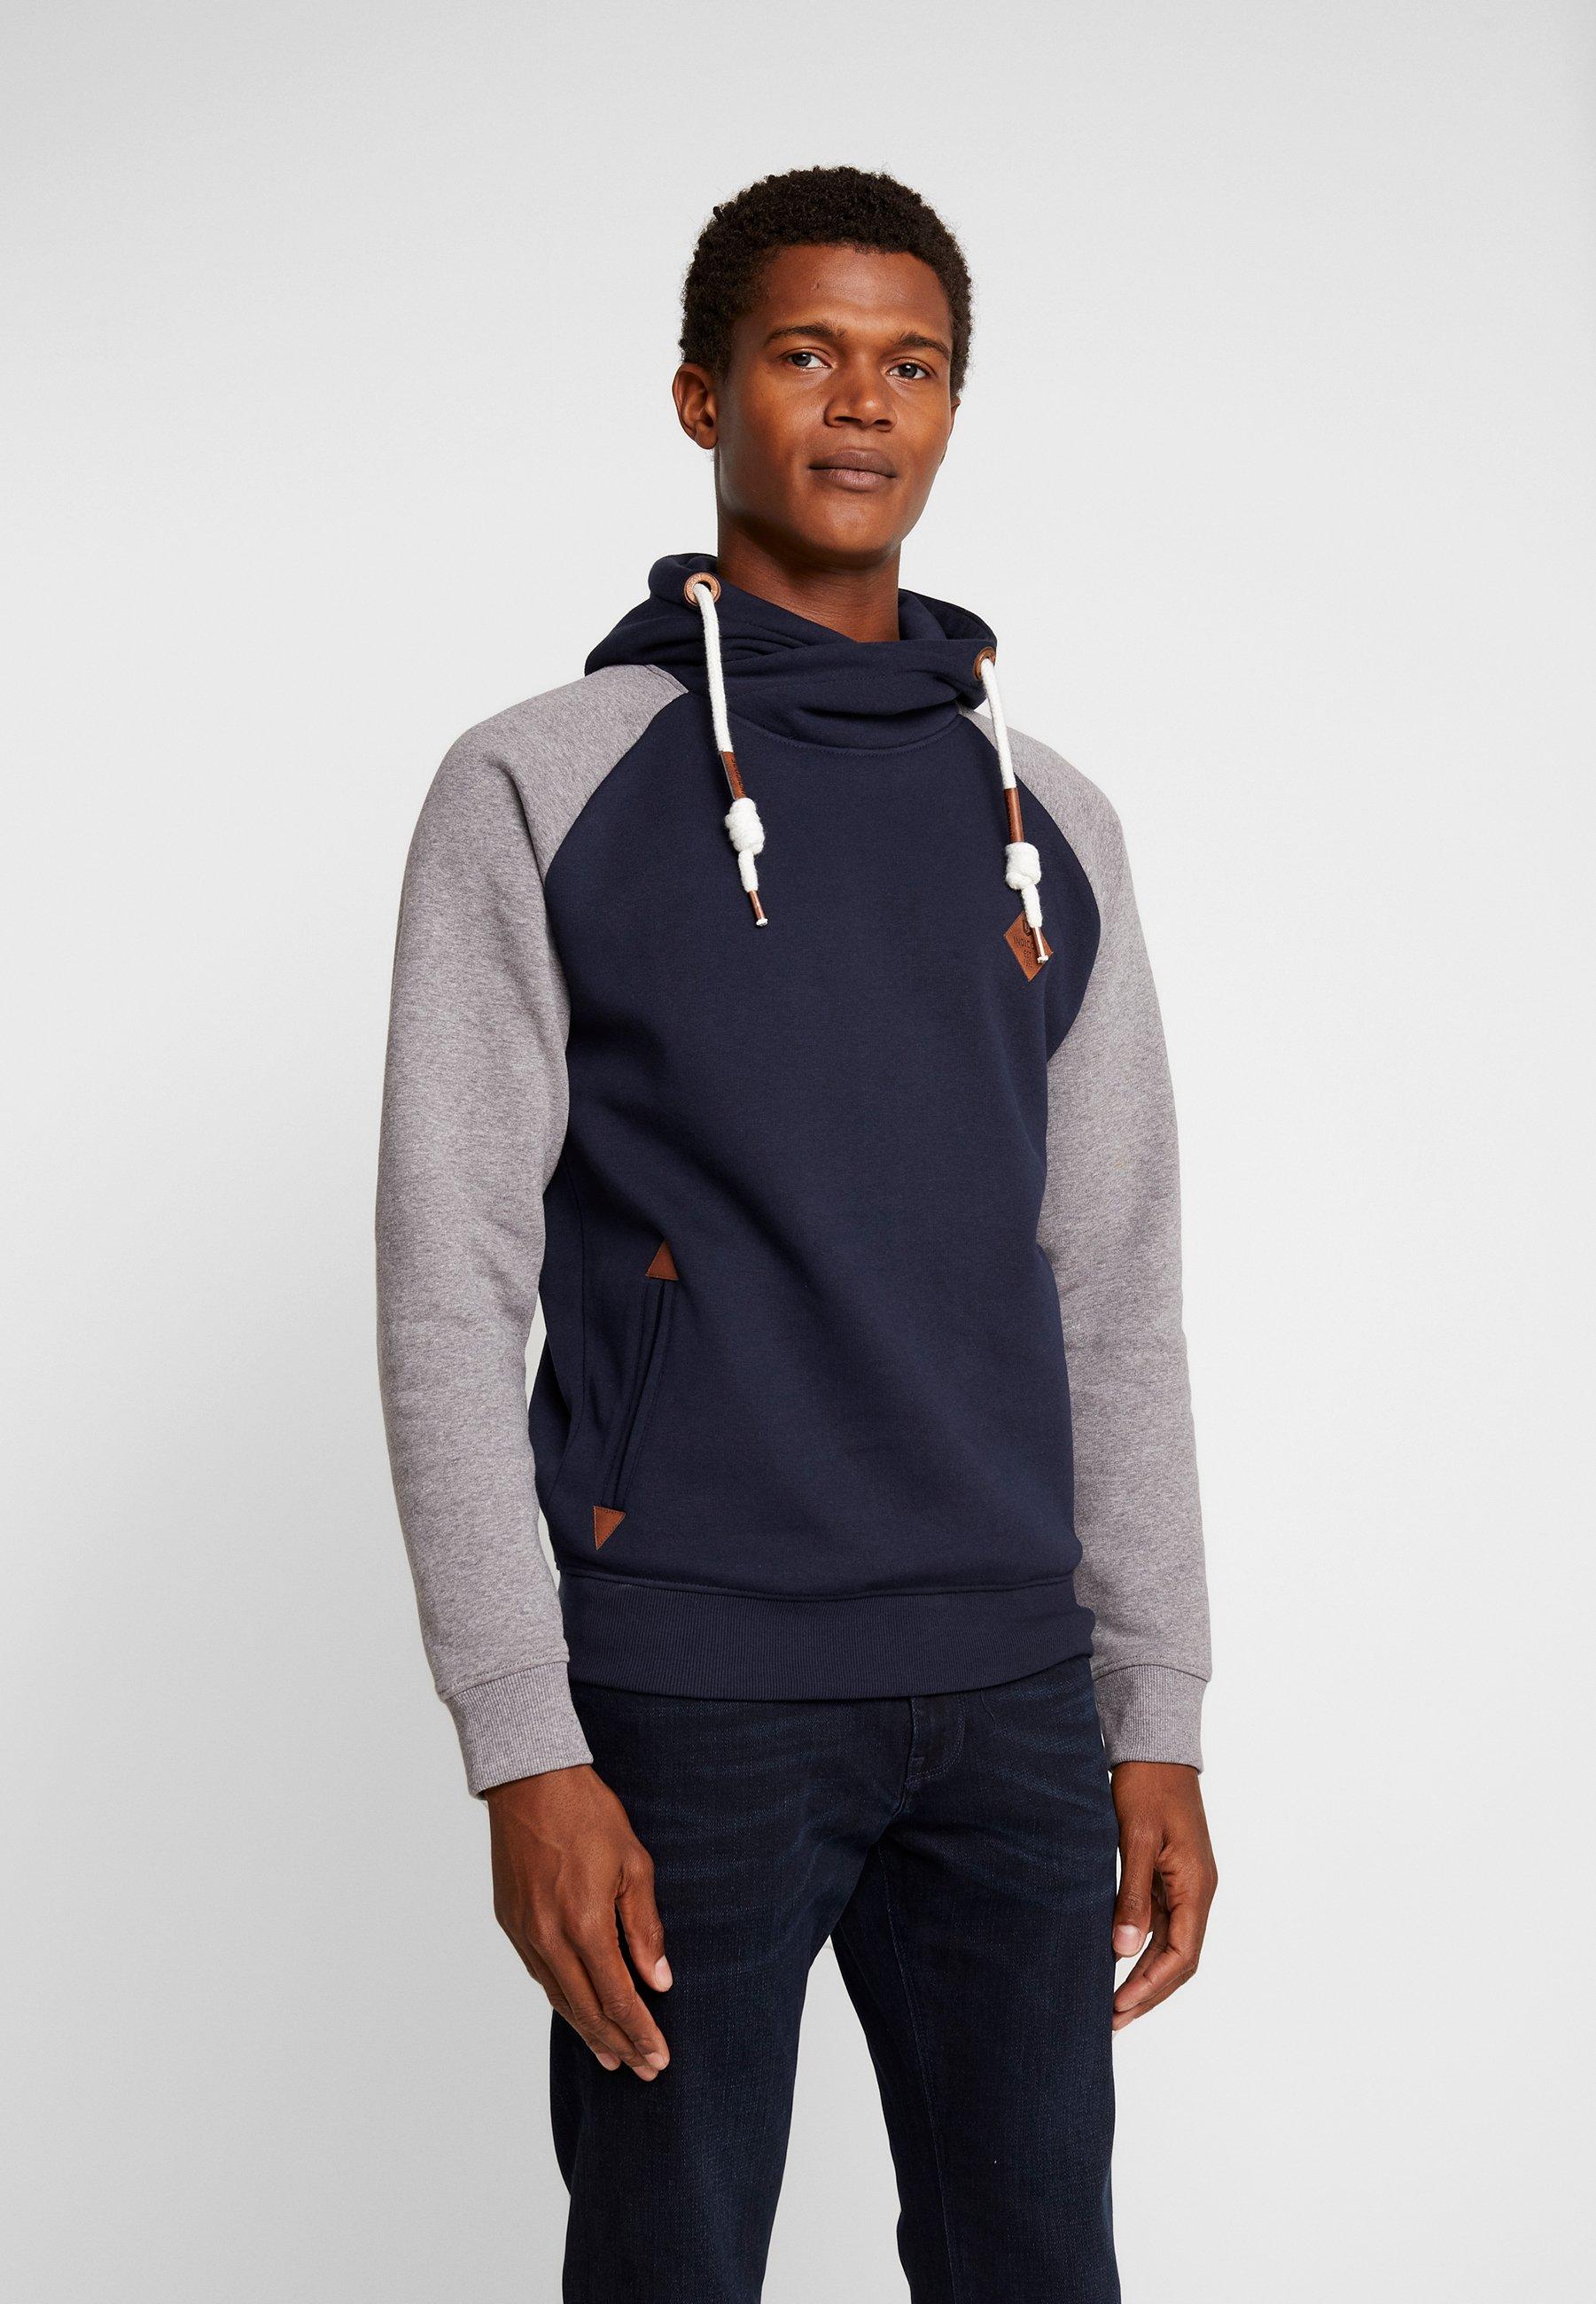 Capuche MarybankSweat Jeans Navy À Indicode kZiOulPTwX